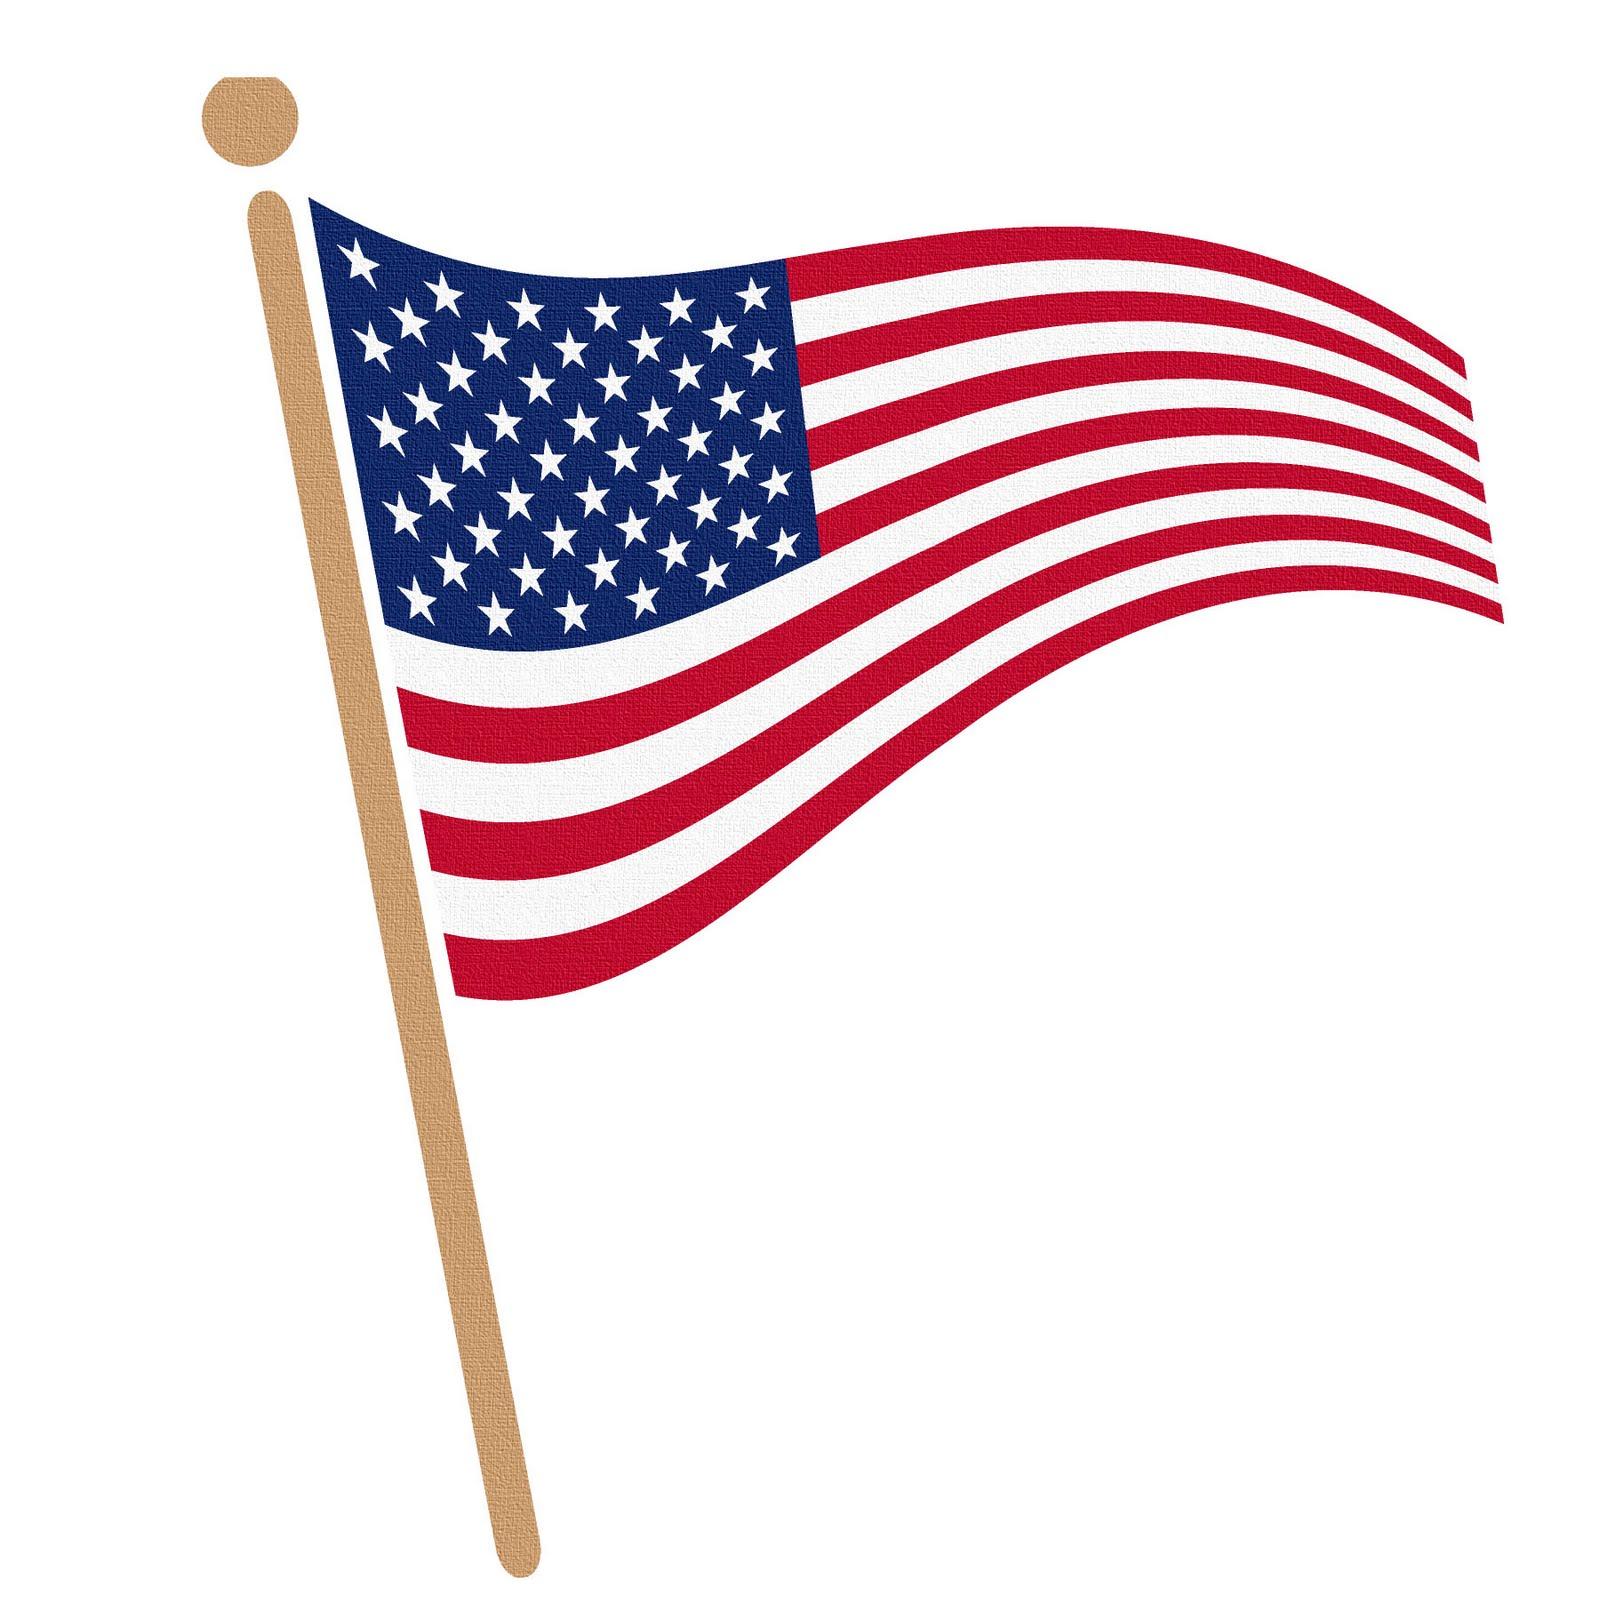 1600x1600 American Flag Clipart Transparent Png